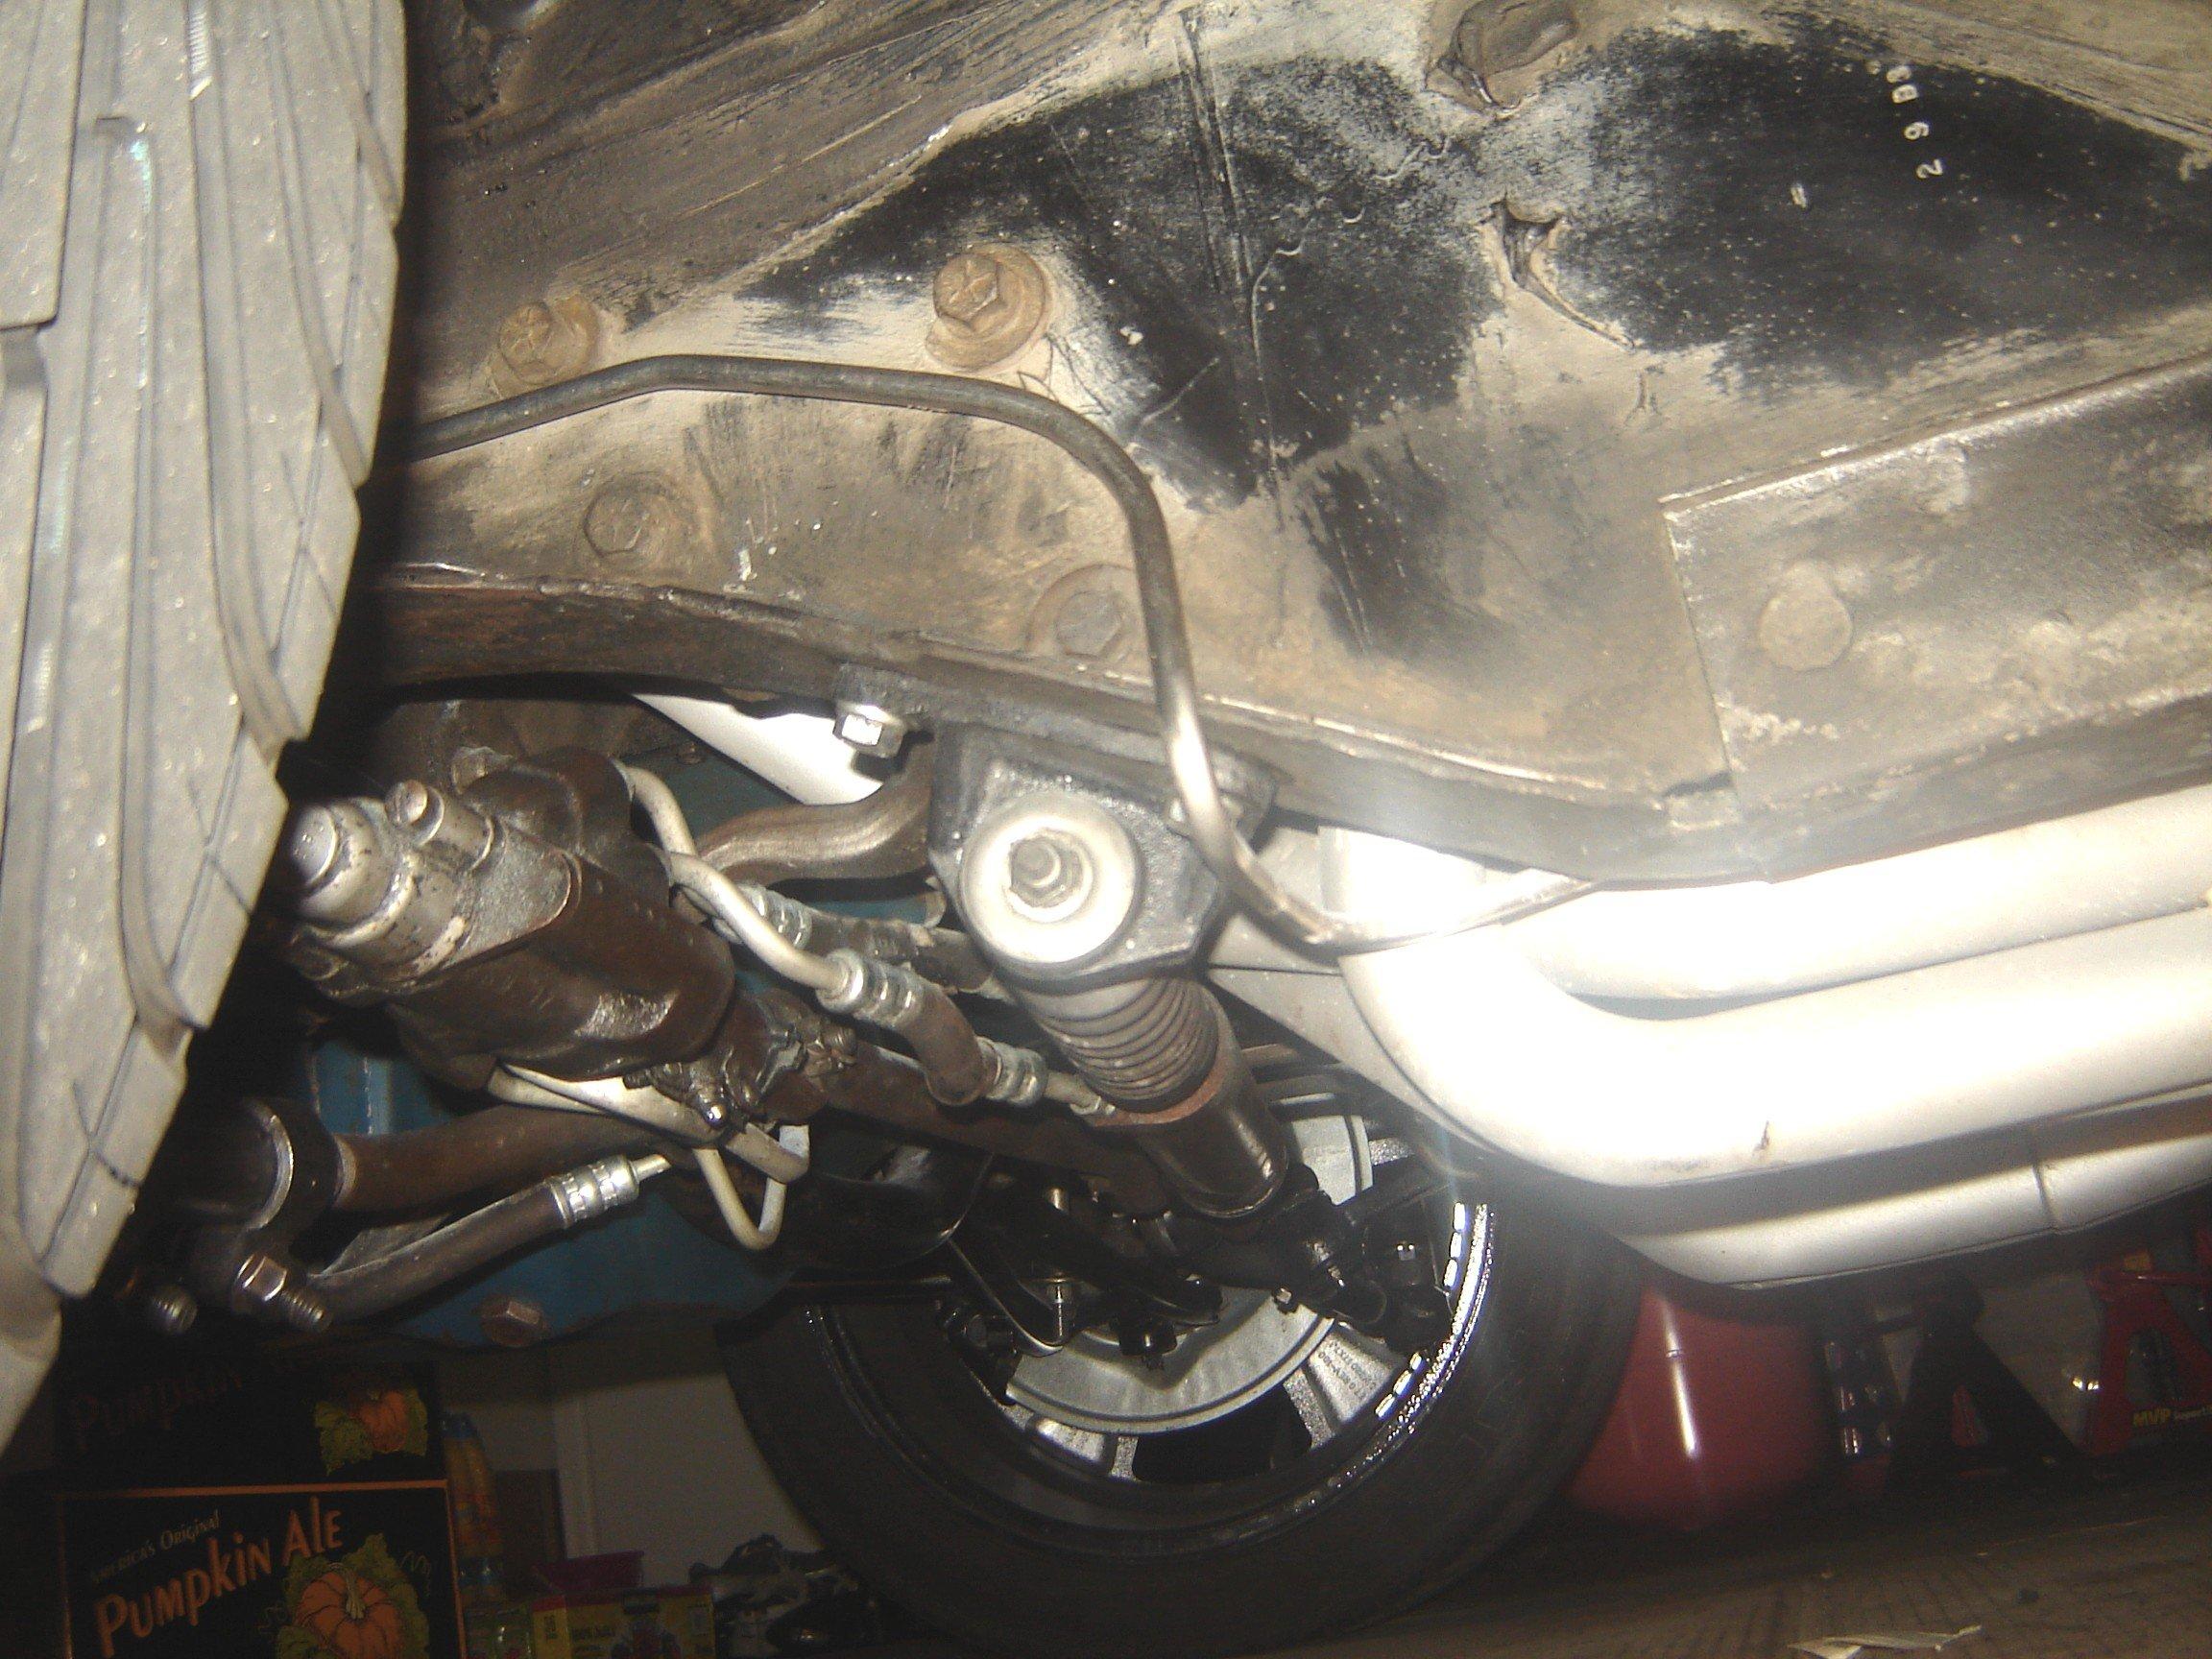 Power steering bracket installation 1966 mustang 102210 jpg